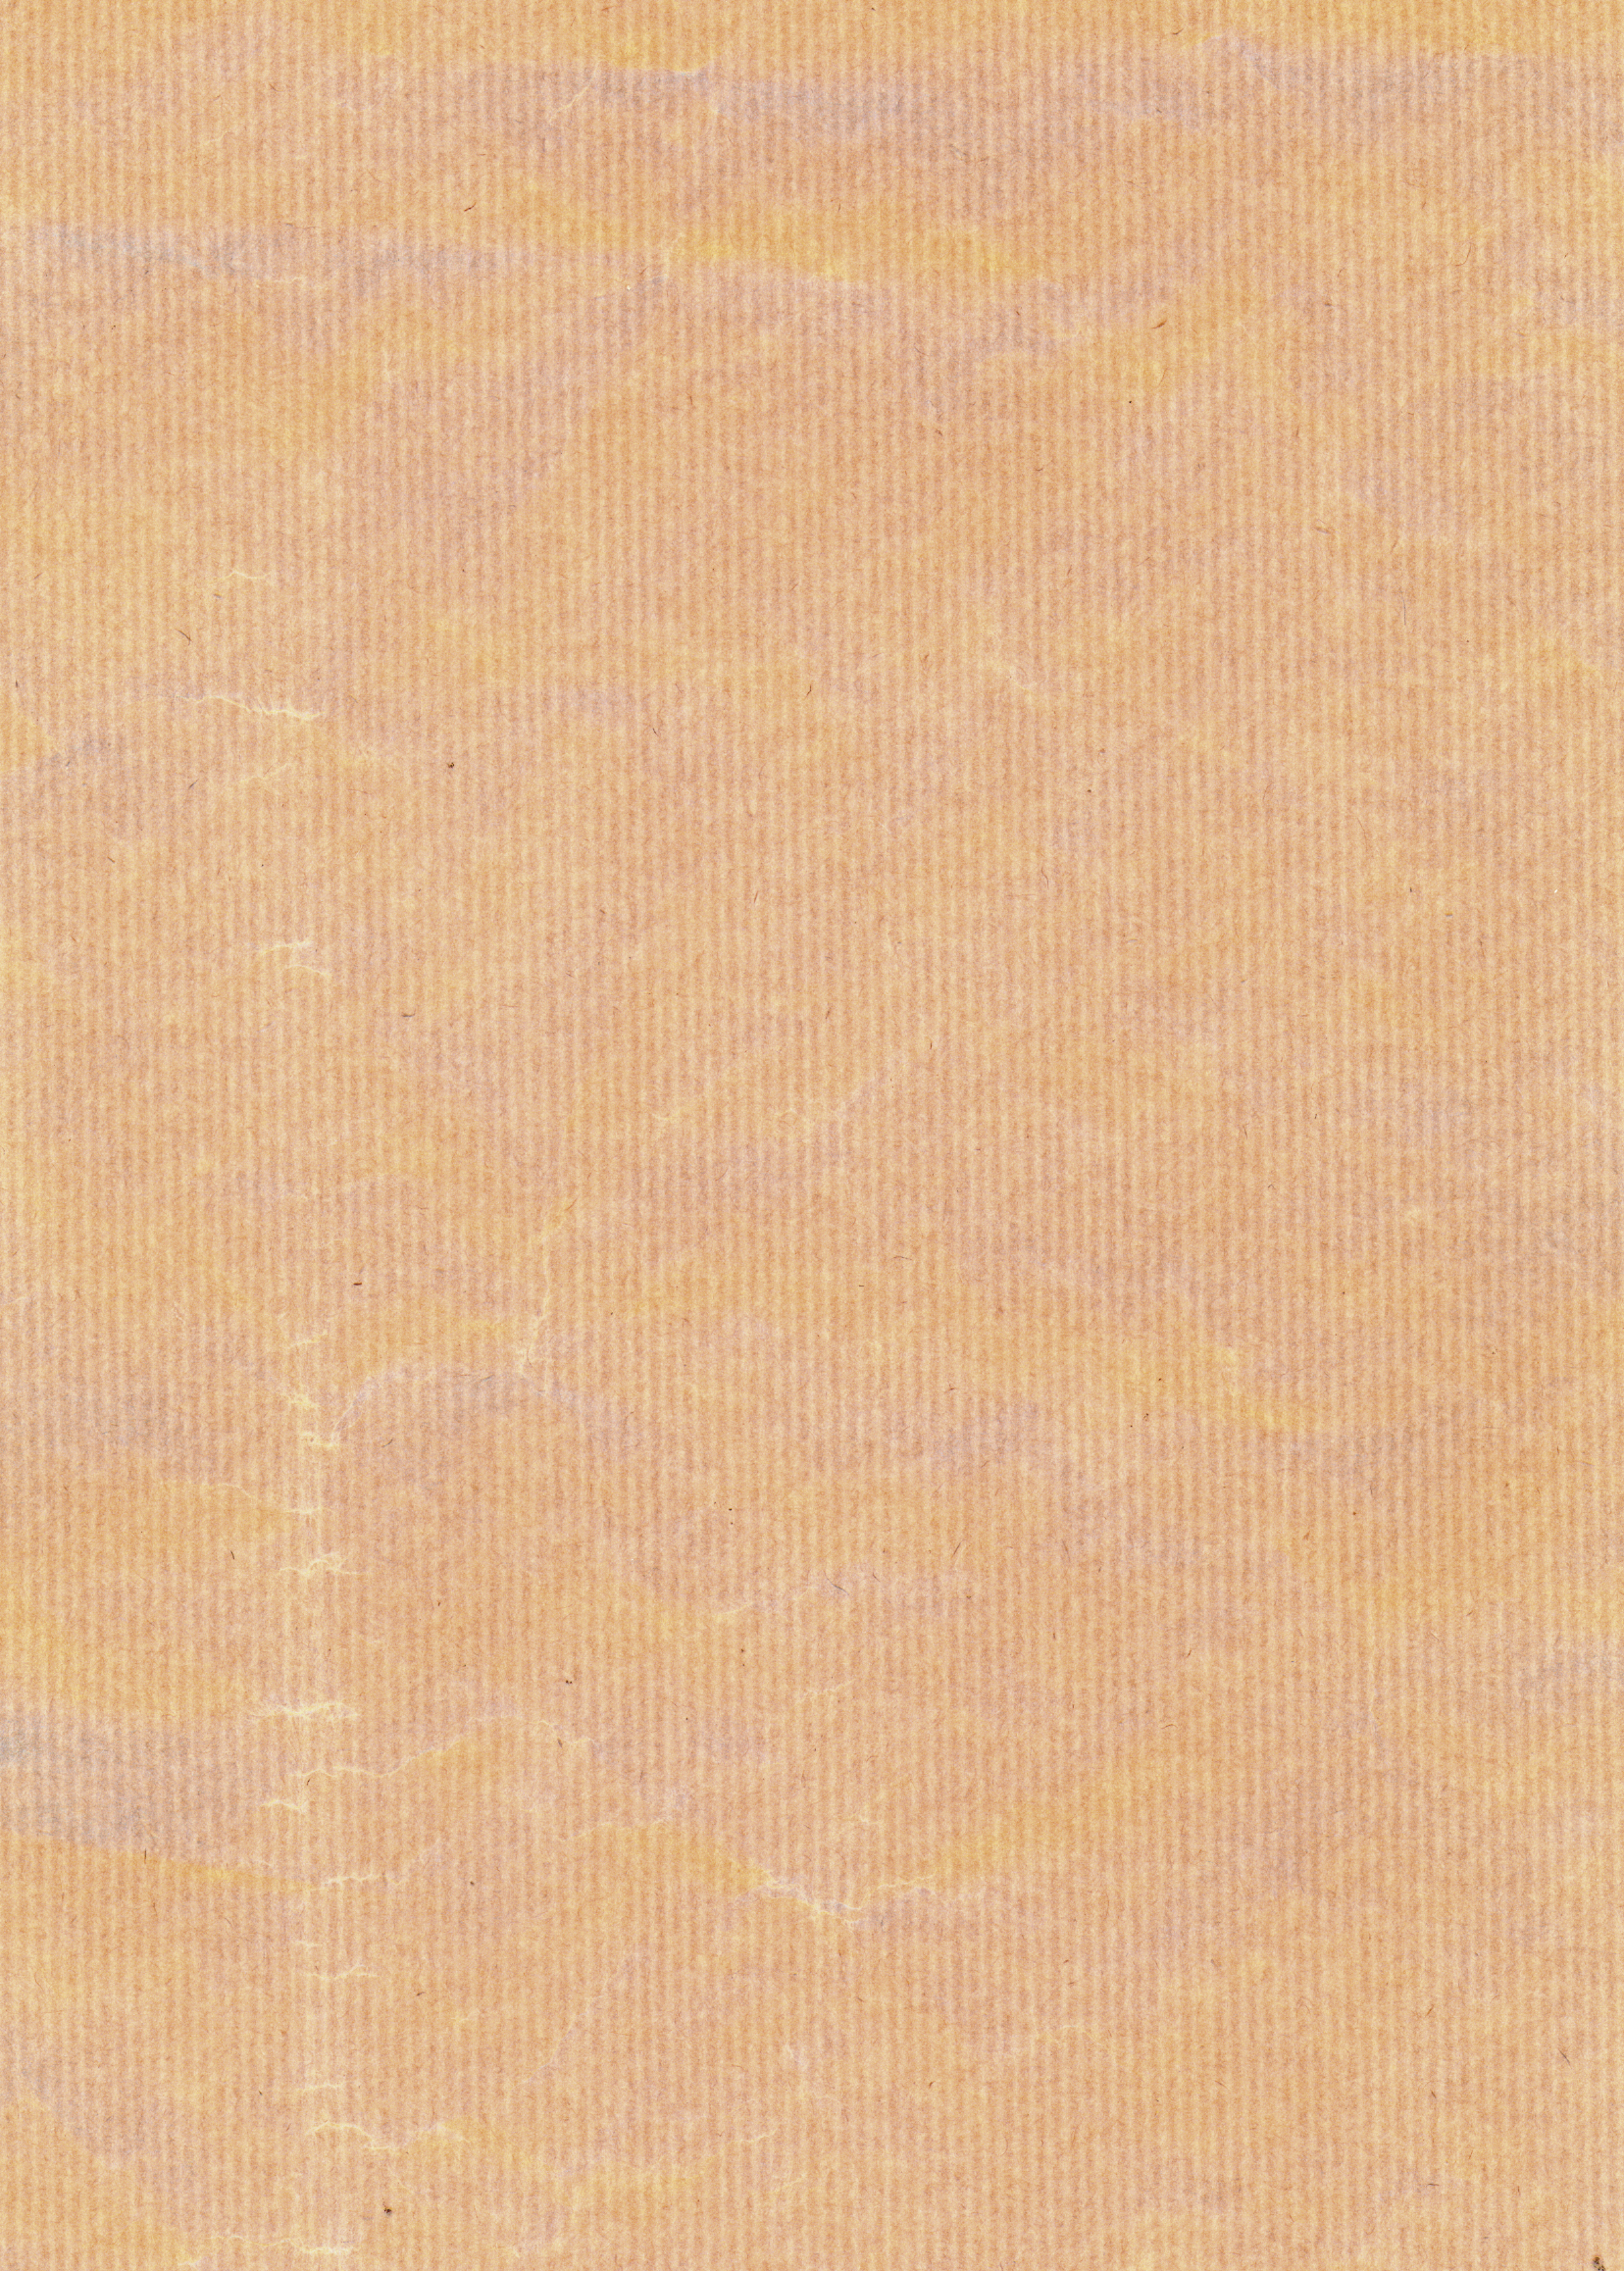 2560x1600 brown paper texture - photo #24